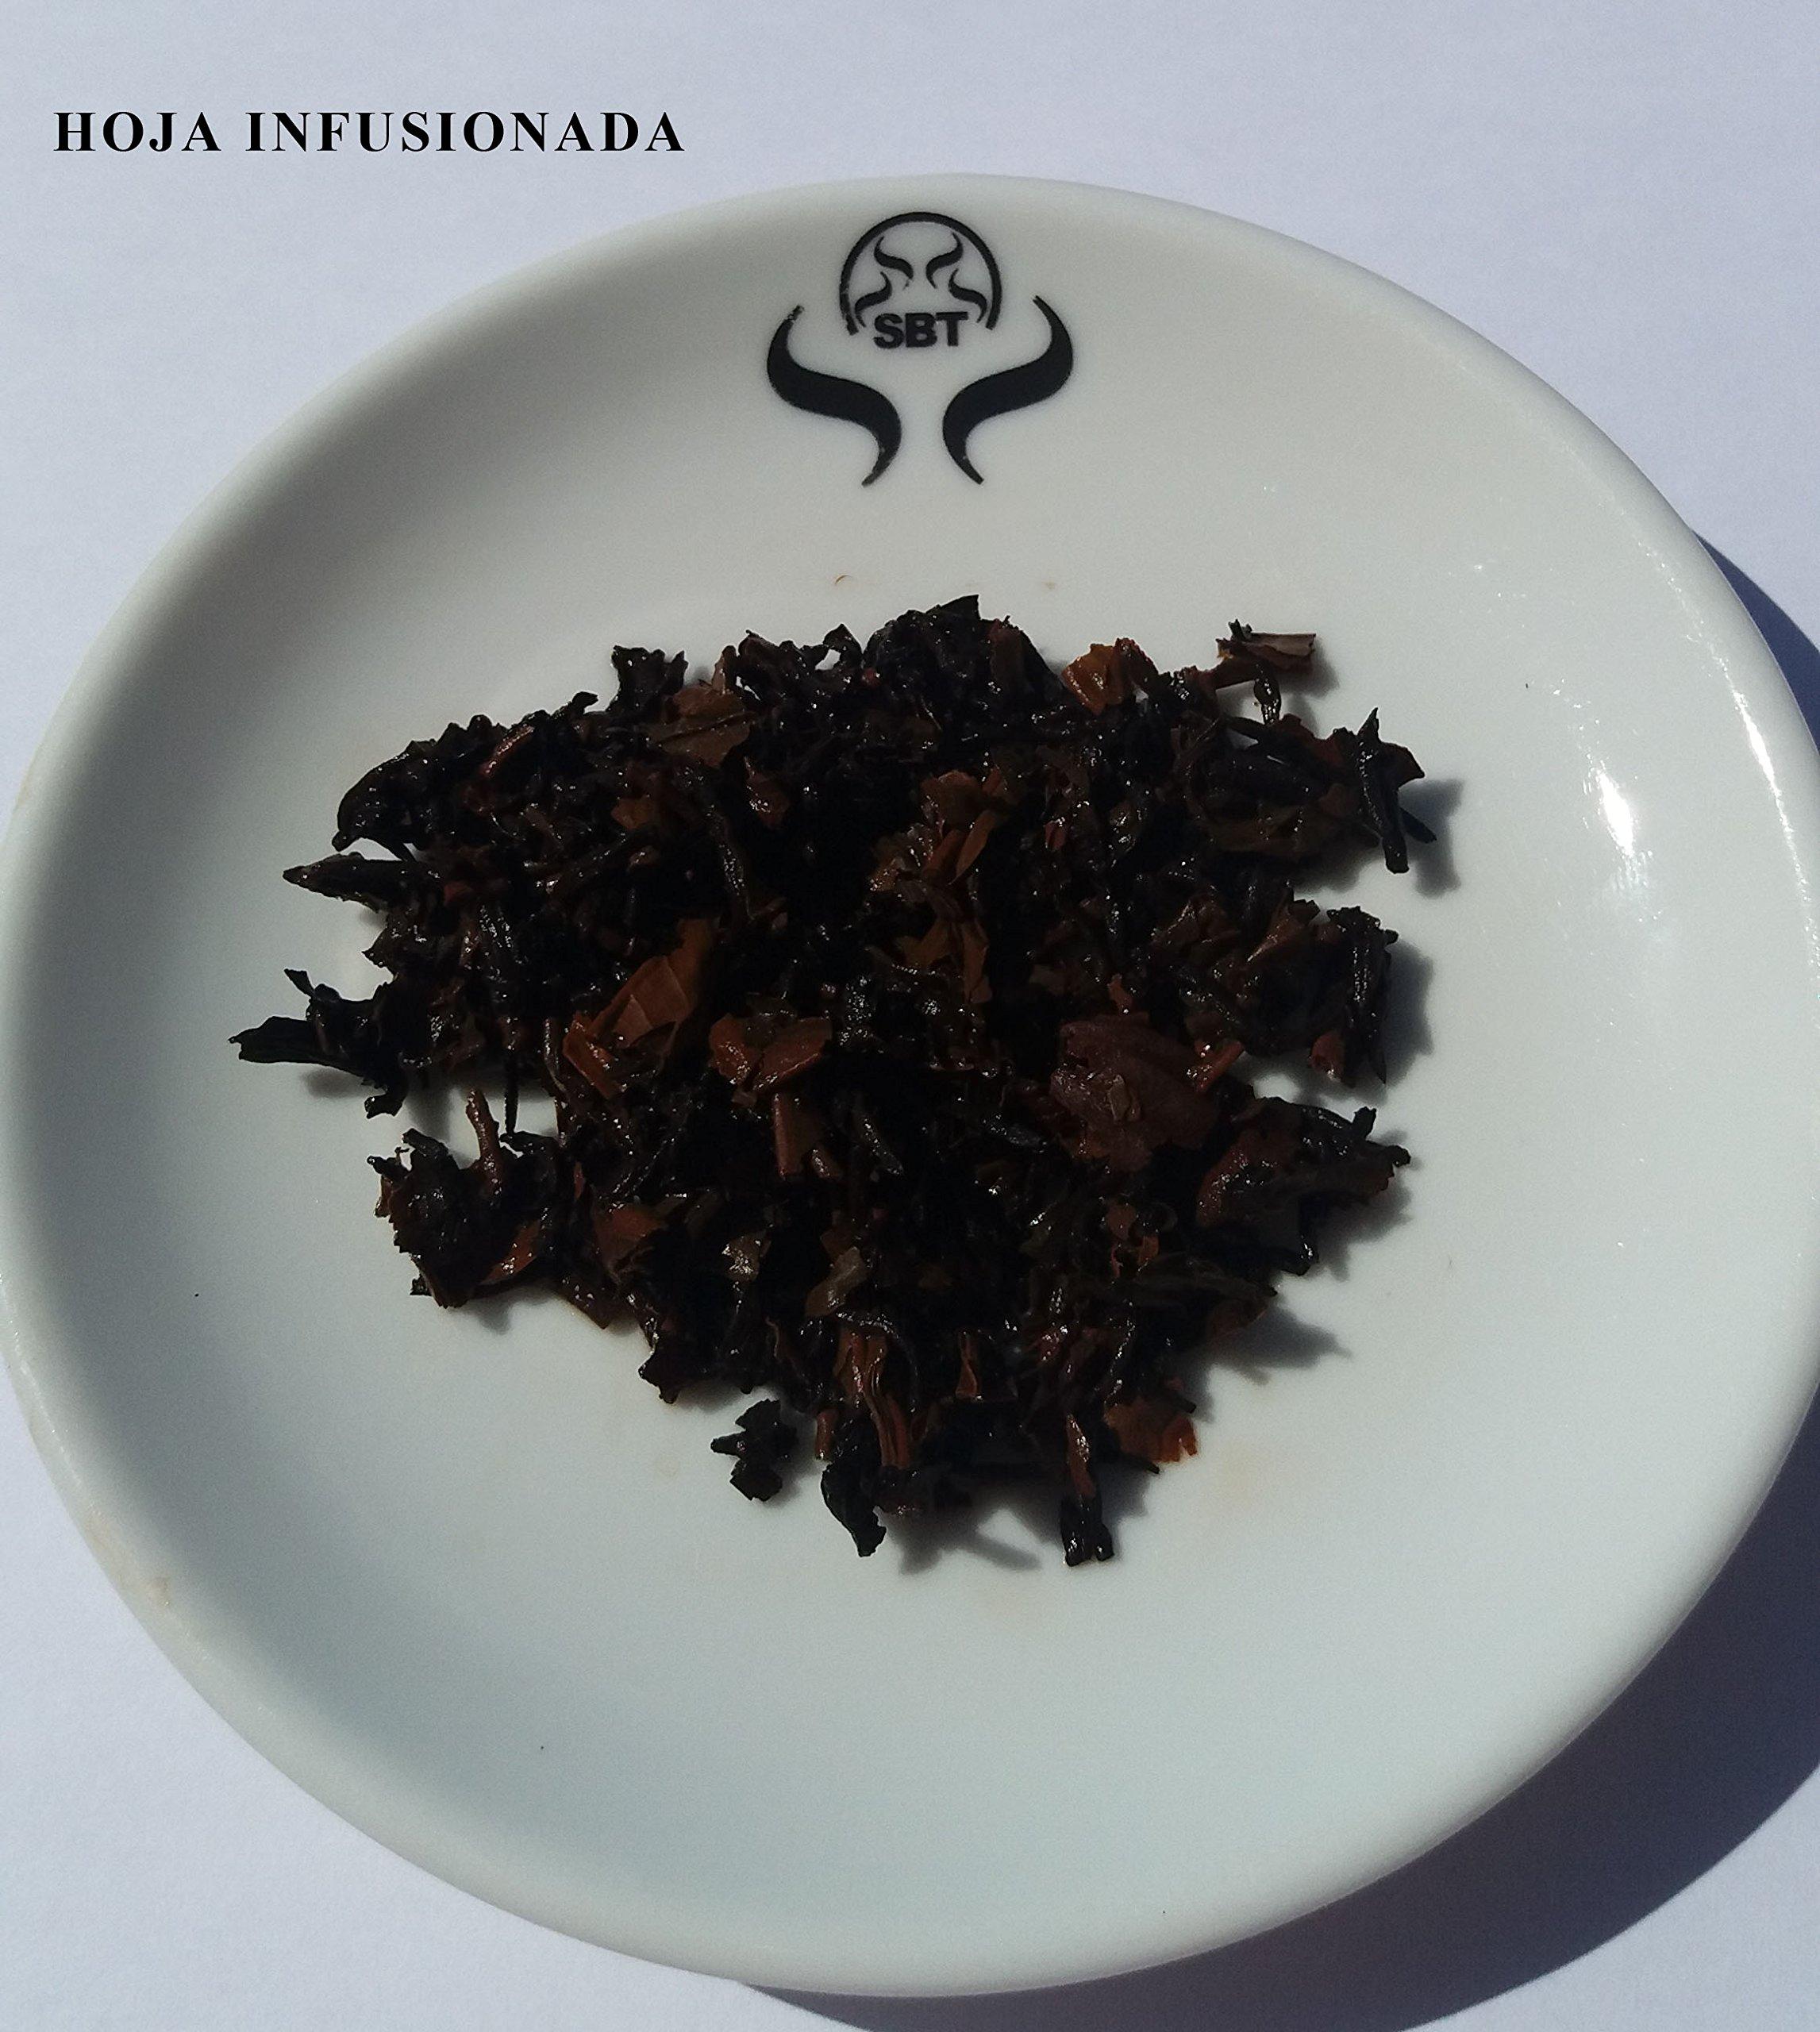 SABOREATE-Y-CAFE-THE-FLAVOUR-SHOP-Pu-Erh-Roter-Tee-Yunnan-China-Vanille-Lose-Bltter-Gewichtsverlust-Dit-abnehmen-100-Gramm